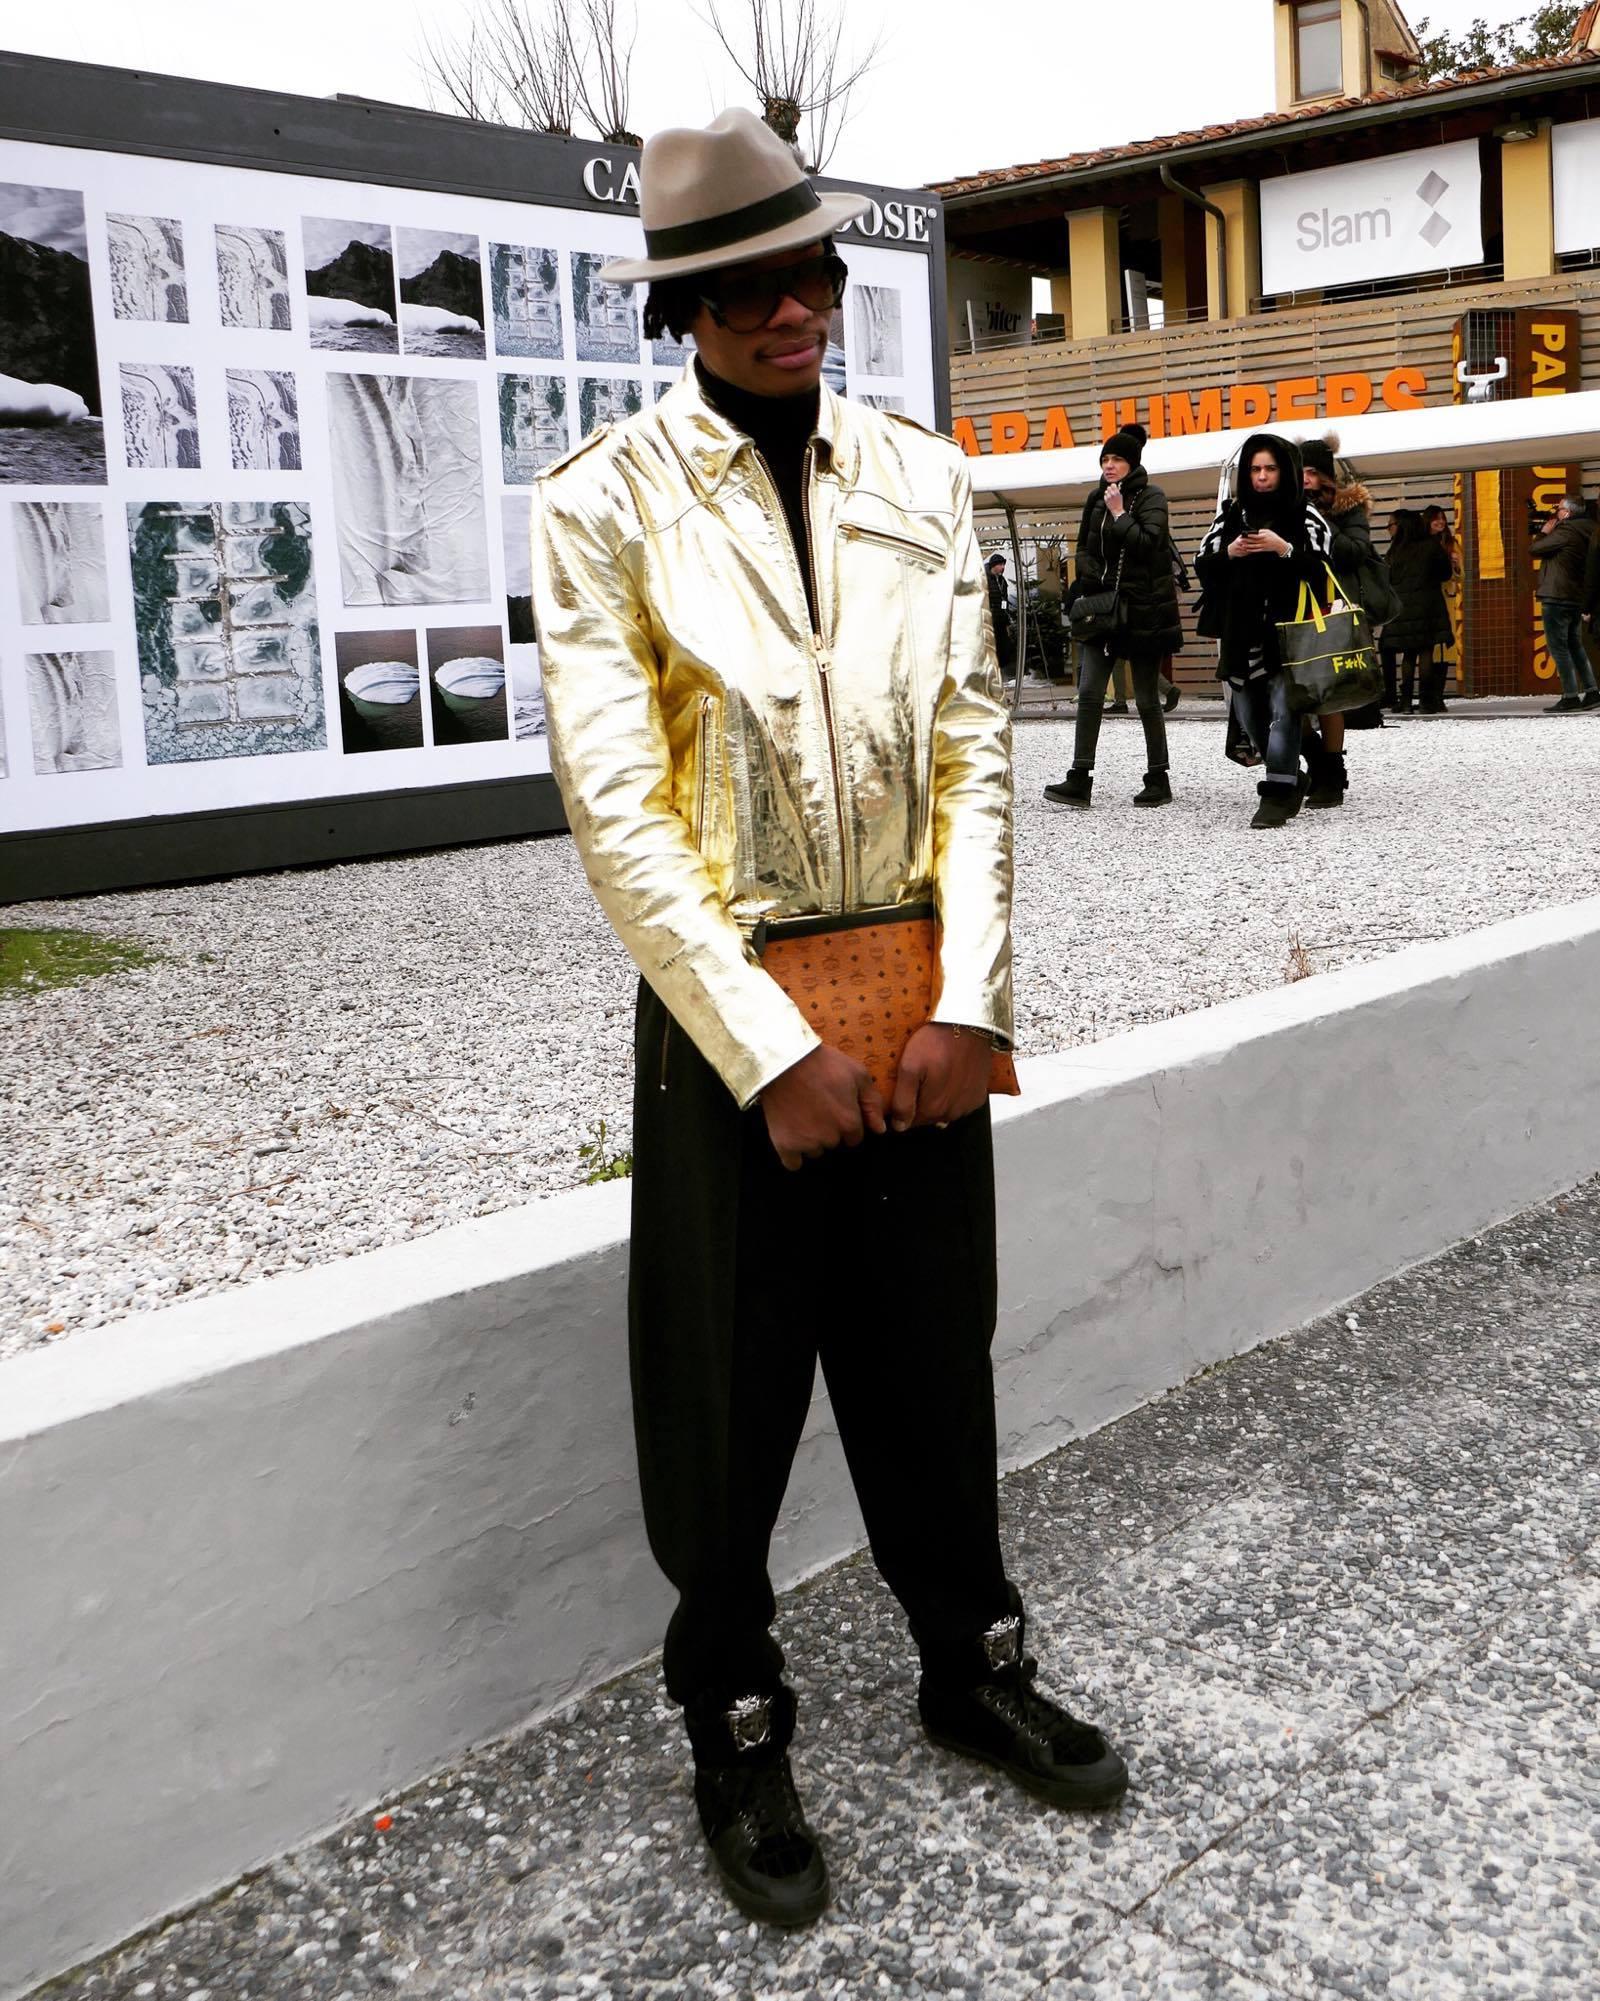 Pitti Uomo (international menswear event held in Florence)2017